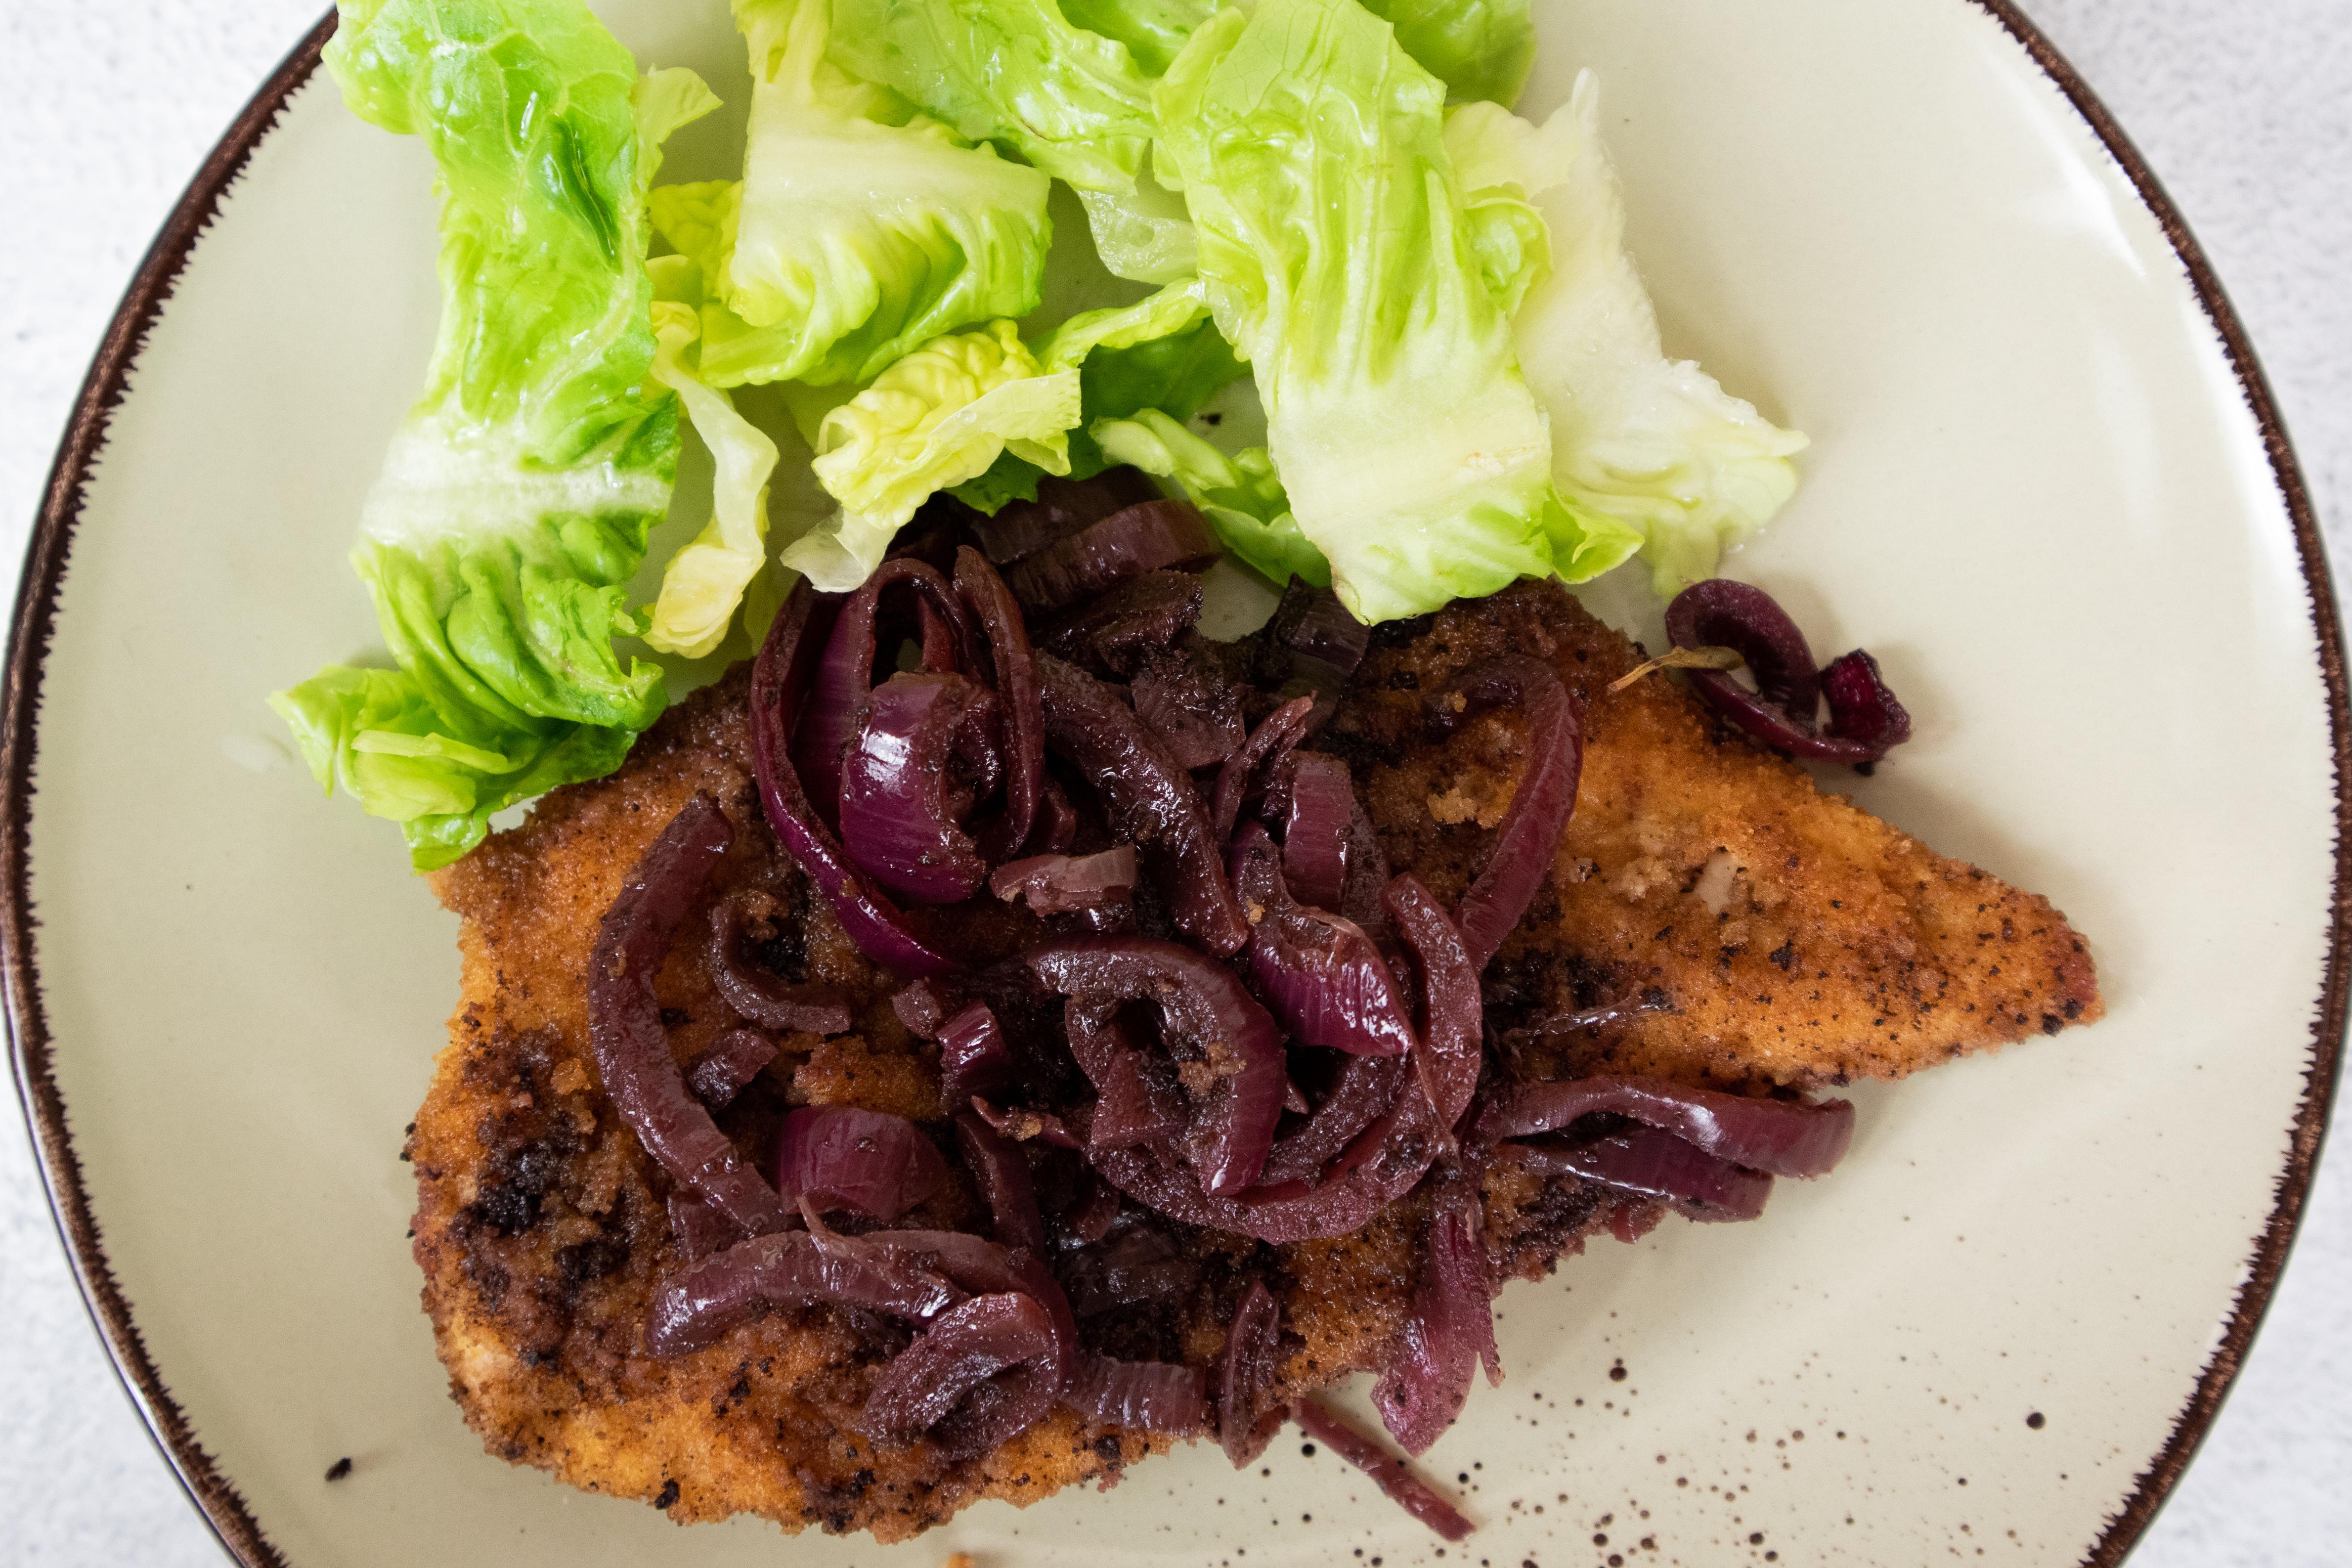 pollo-carpione-chicken-cutlets-recipe-italianrecipe-foodblog-food